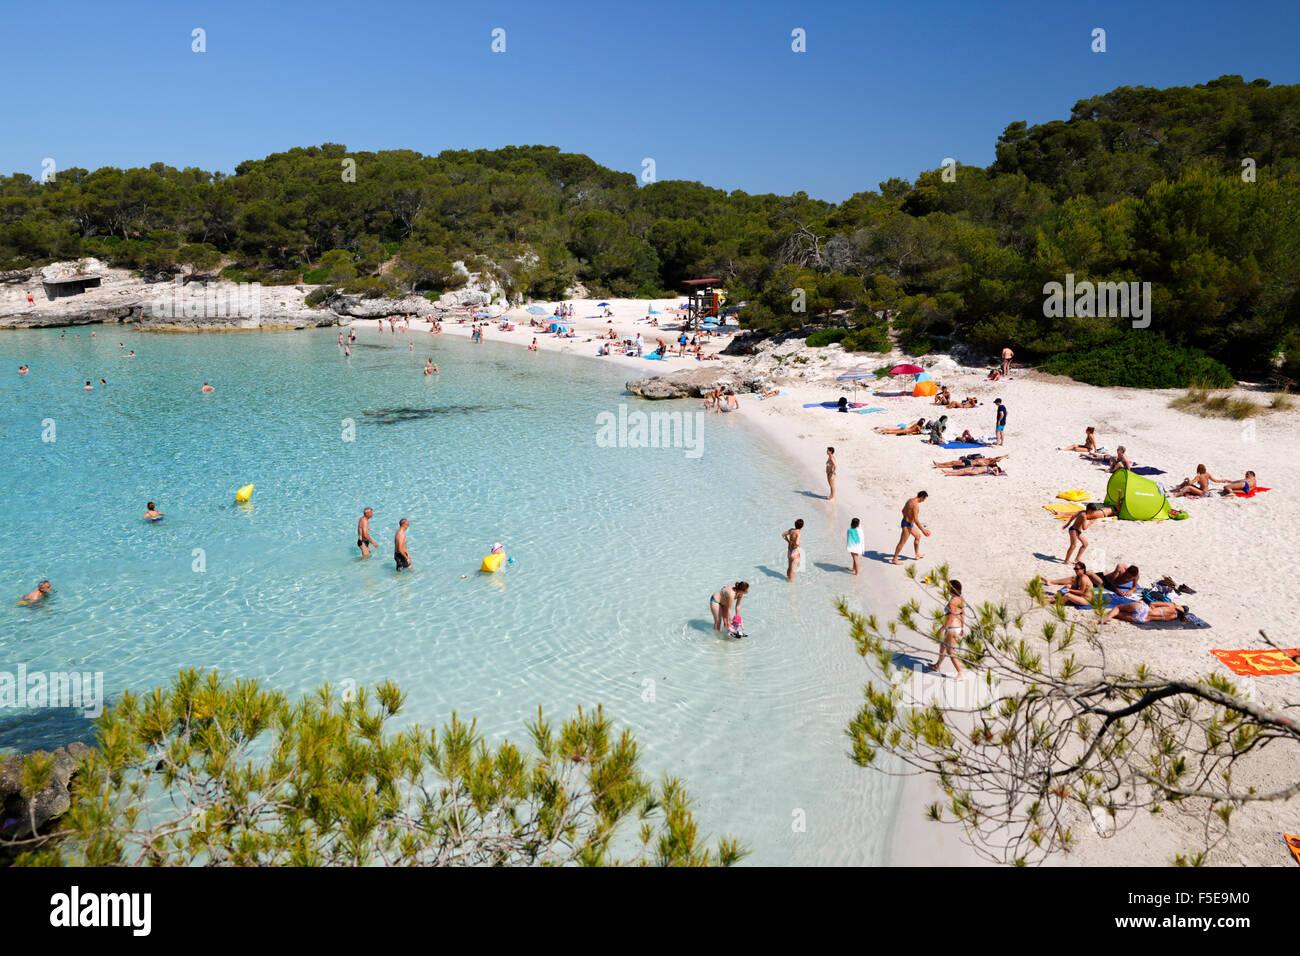 Cala en Turqueta, côte sud-ouest, près de Ciutadella, Minorque, Iles Baléares, Espagne, Méditerranée, Photo Stock